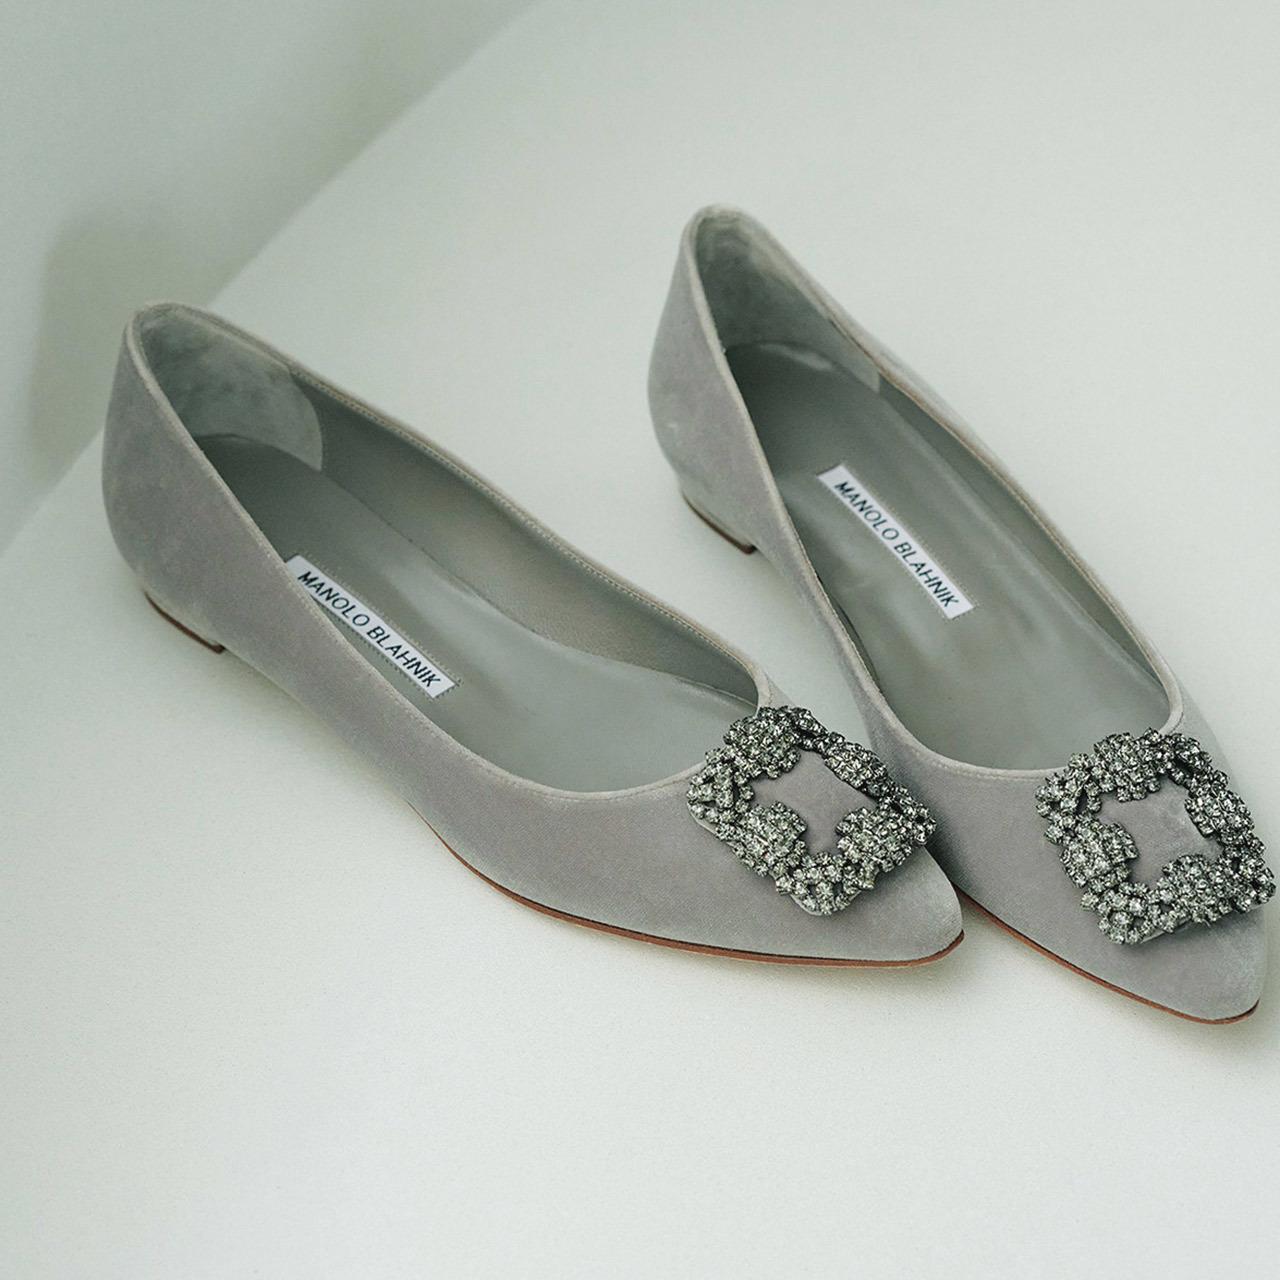 MANOLO BLAHNIKのフラット靴